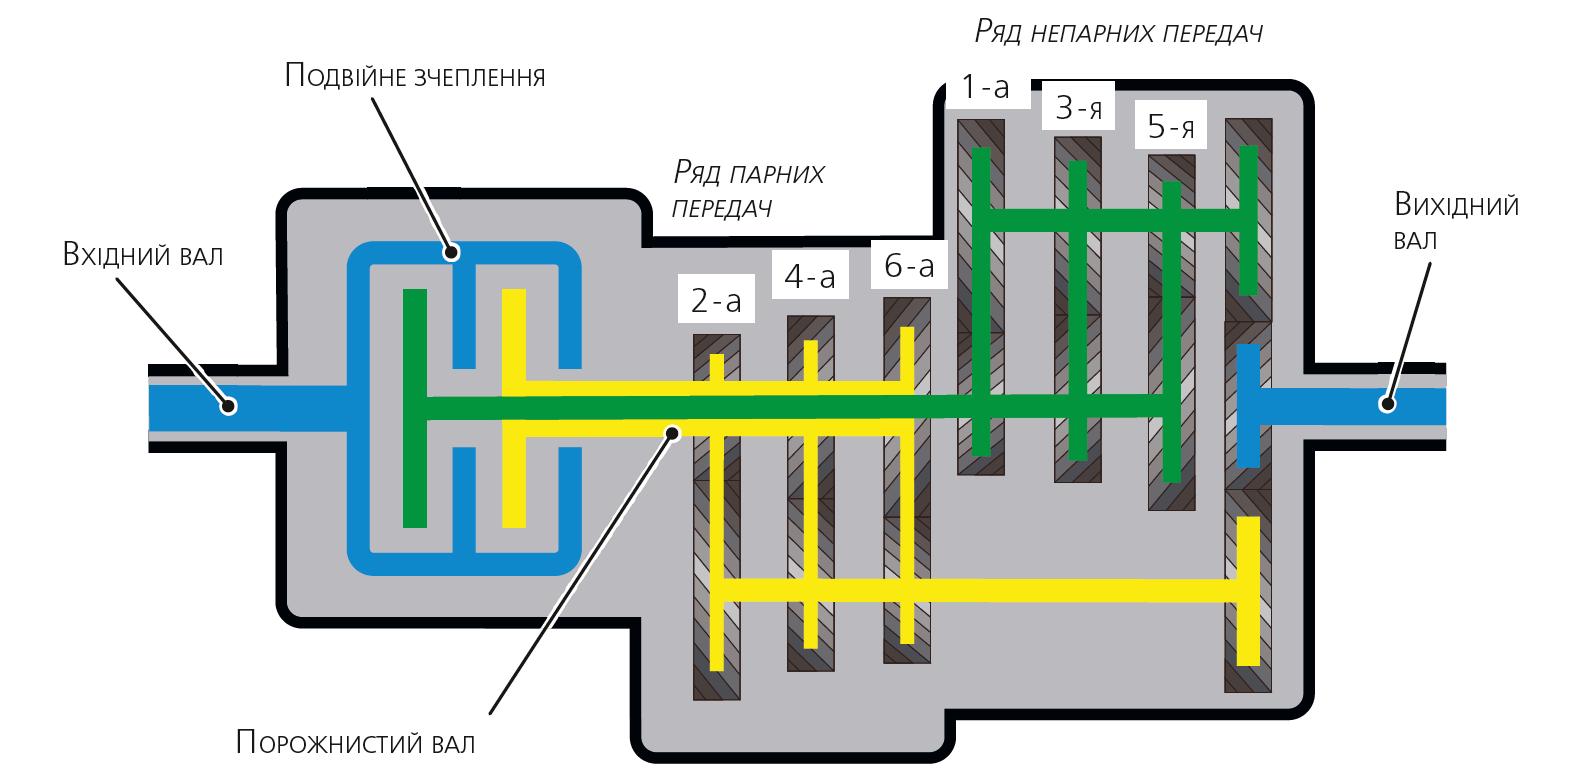 Схема преселективної коробки передач